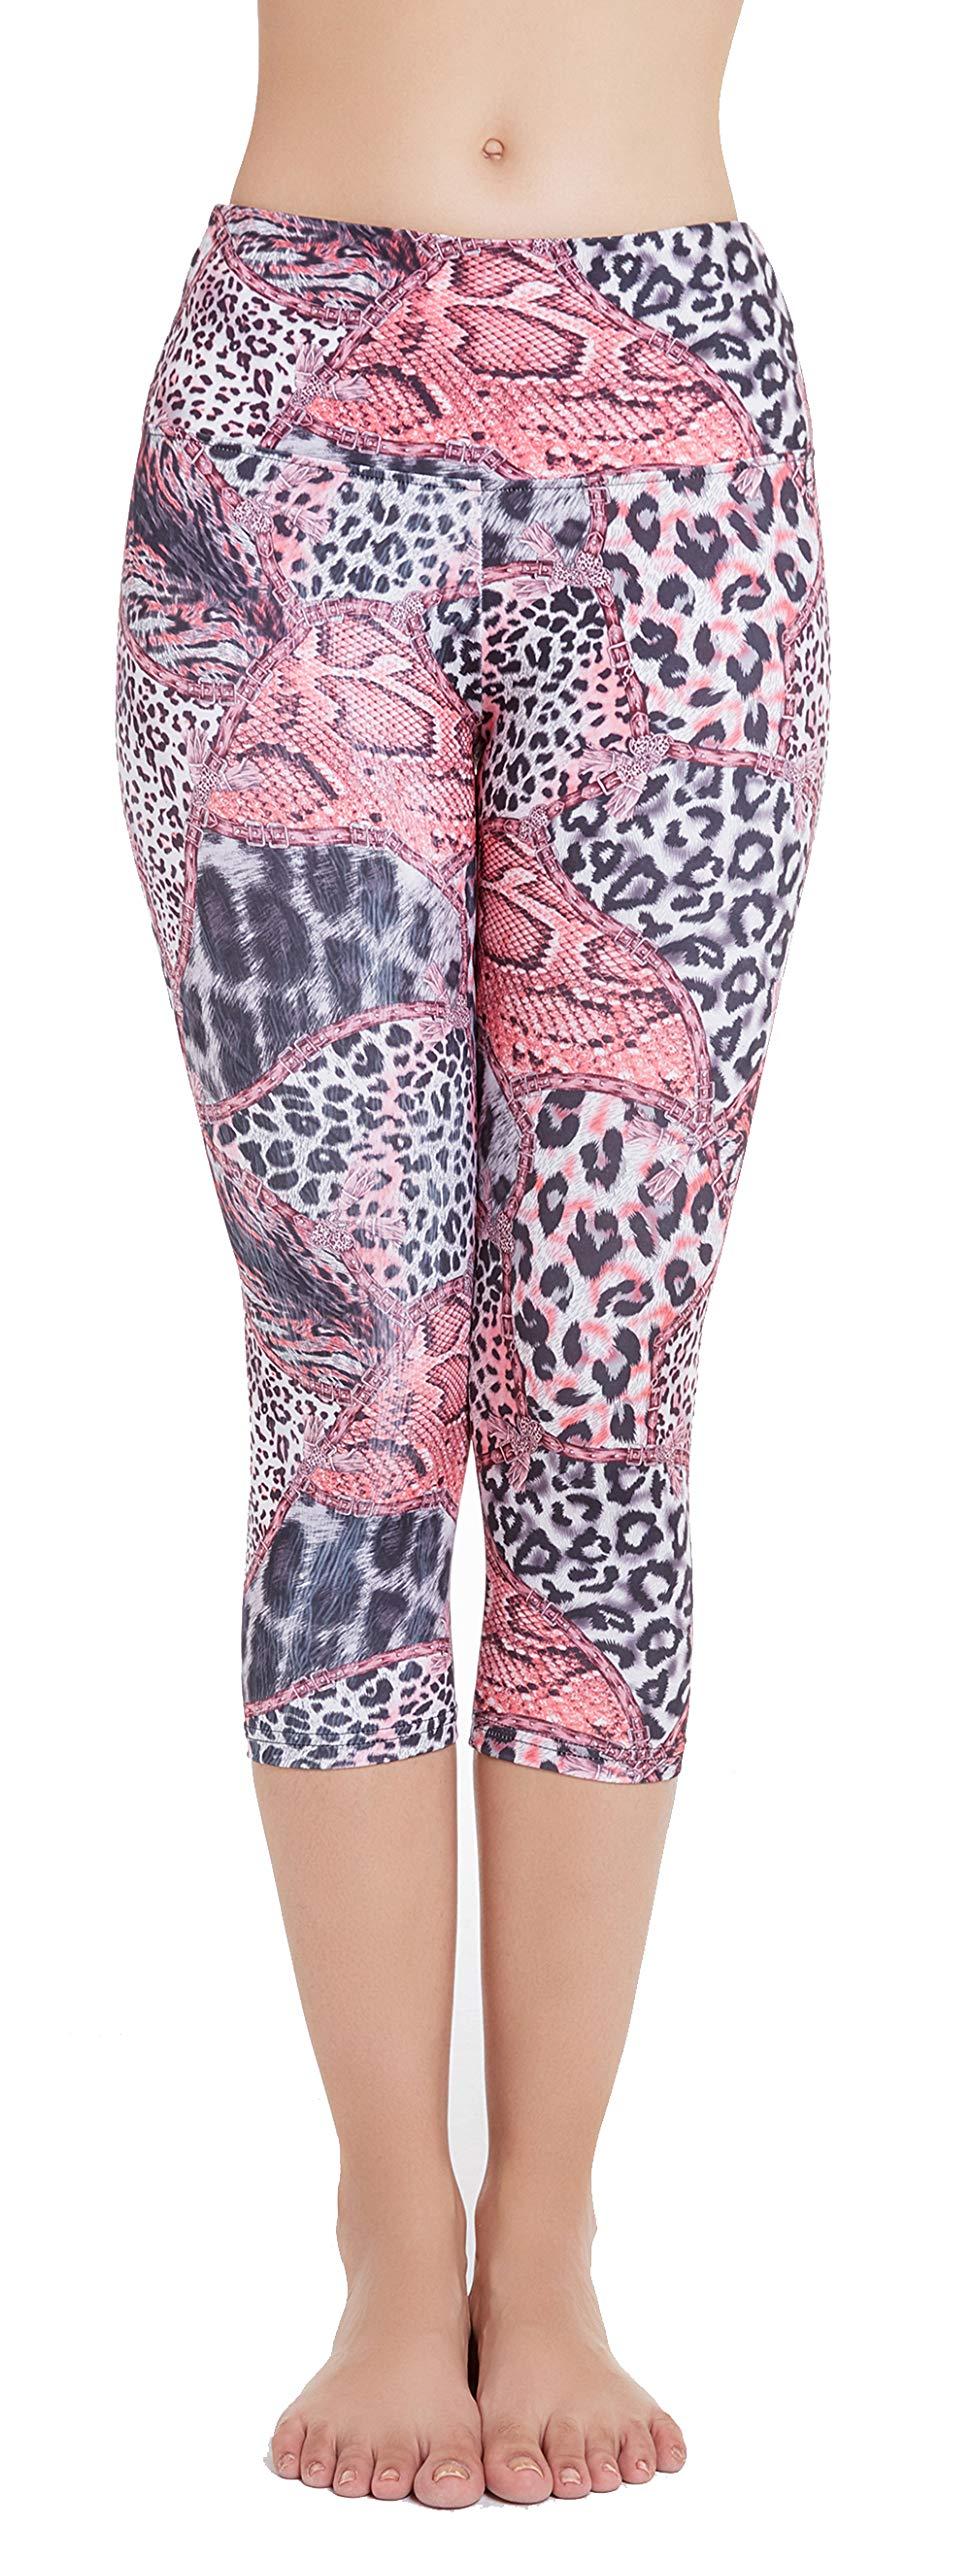 Picotee Women's Printed Yoga Pants Workout Running Capri Leggings w Hidden Pocket (Leopard, M)